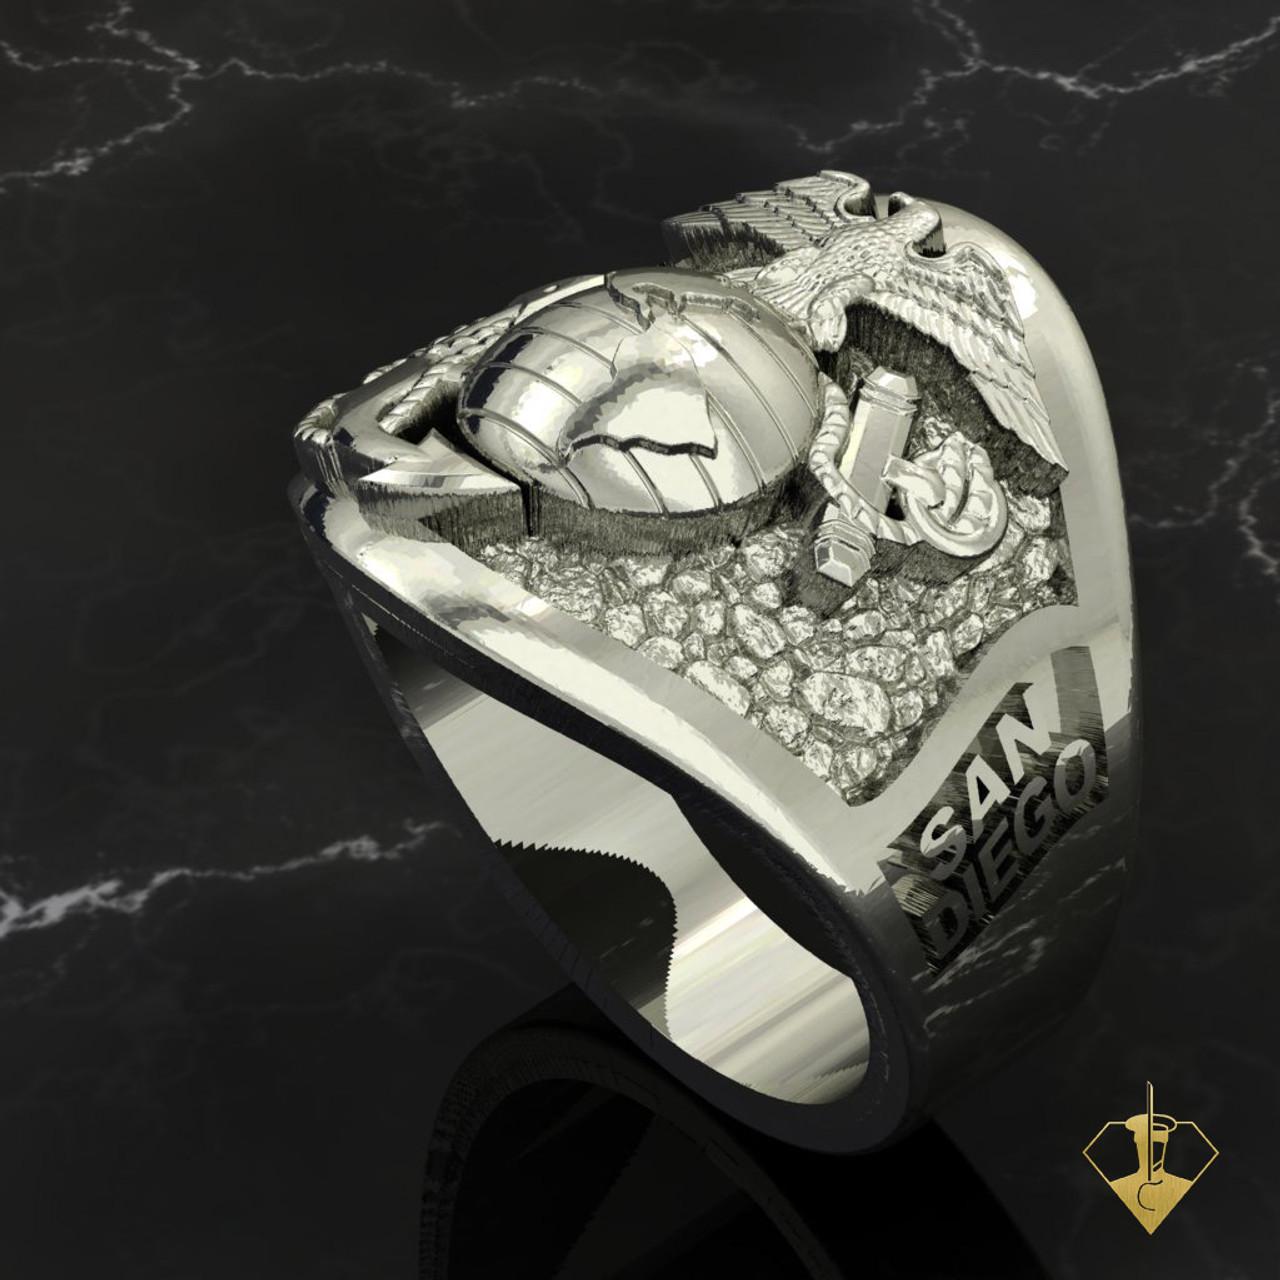 San Diego Graduation Ring 10k White Gold